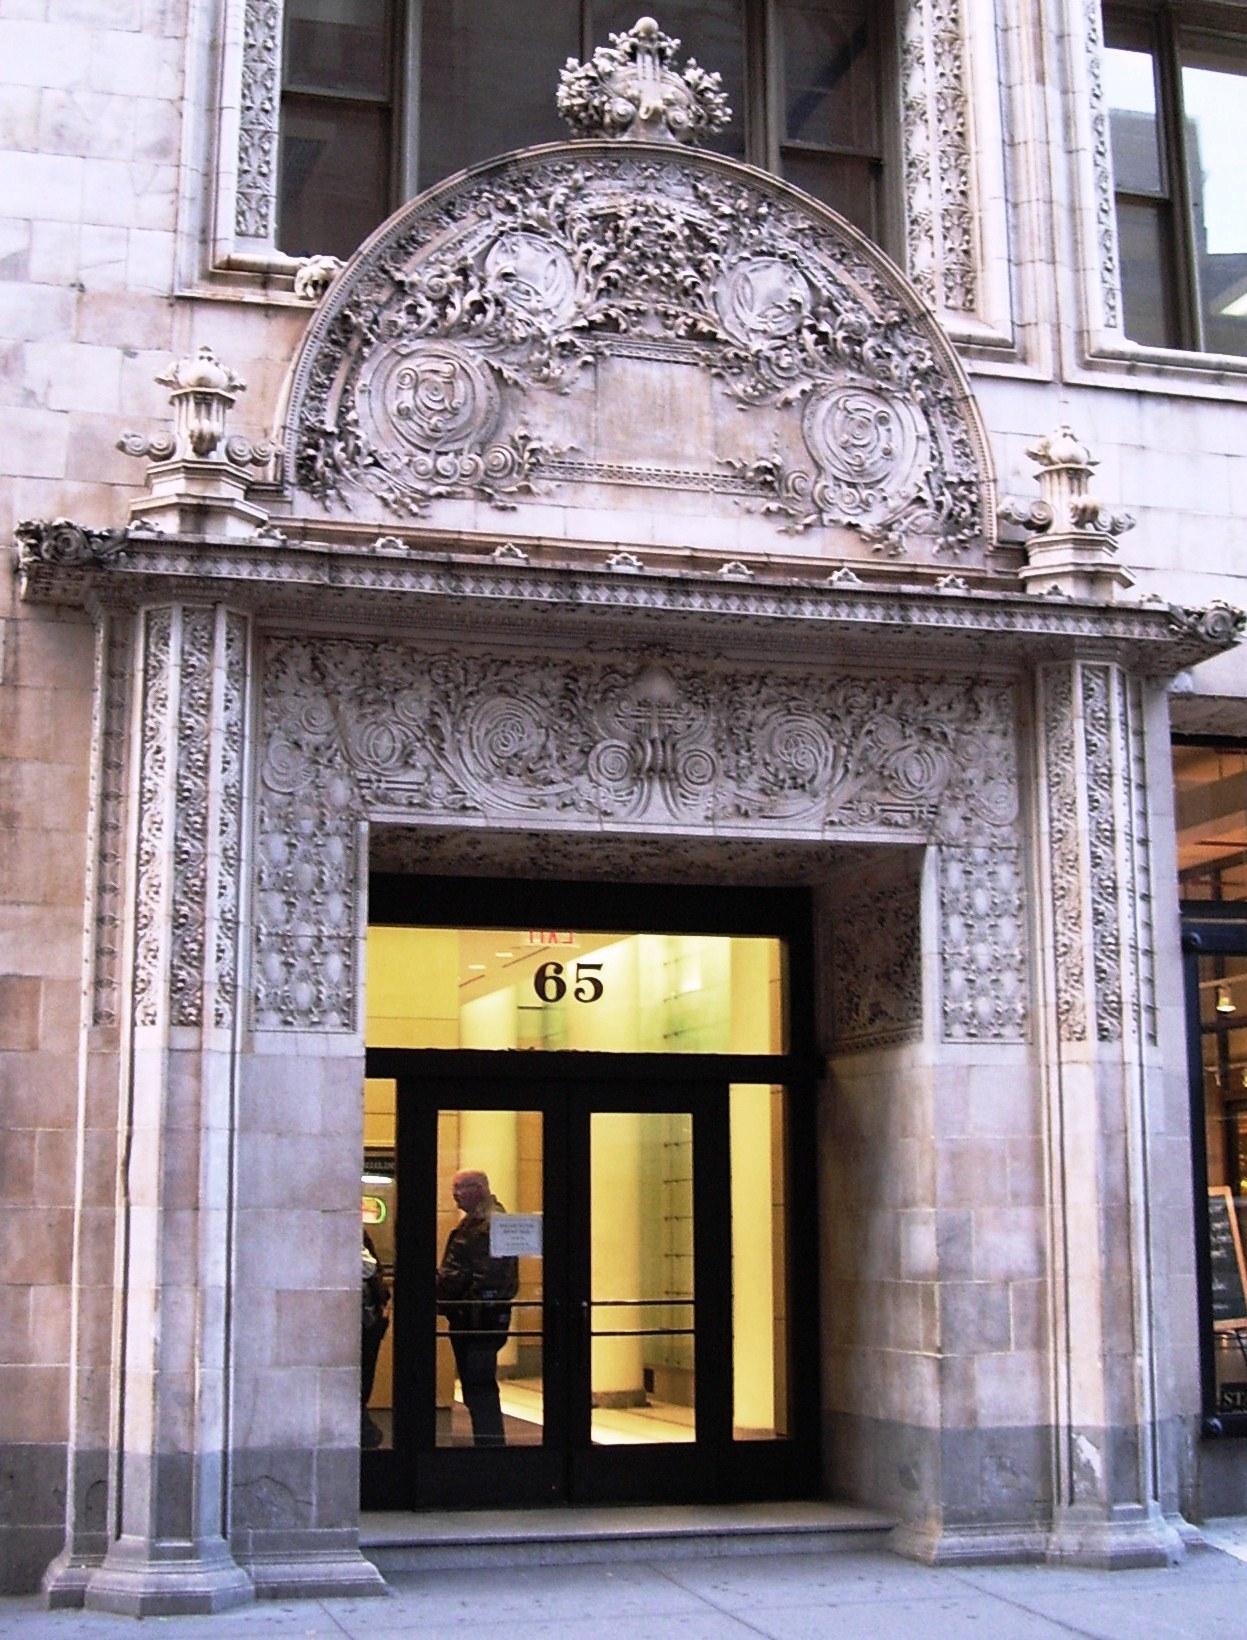 Description bayard condict building entrance